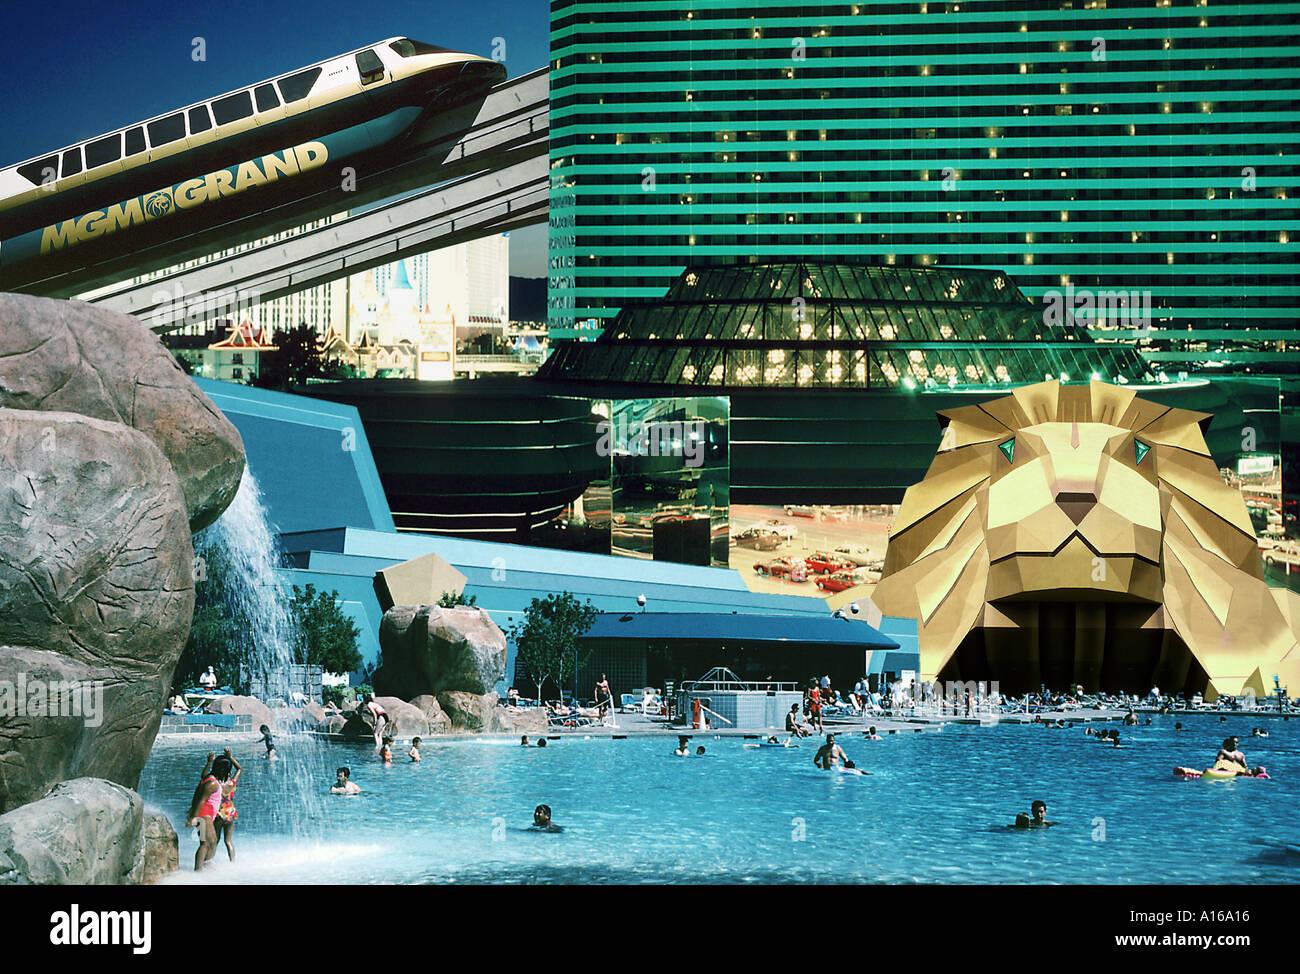 The mgm grand hotel and casino biloxi casino opening